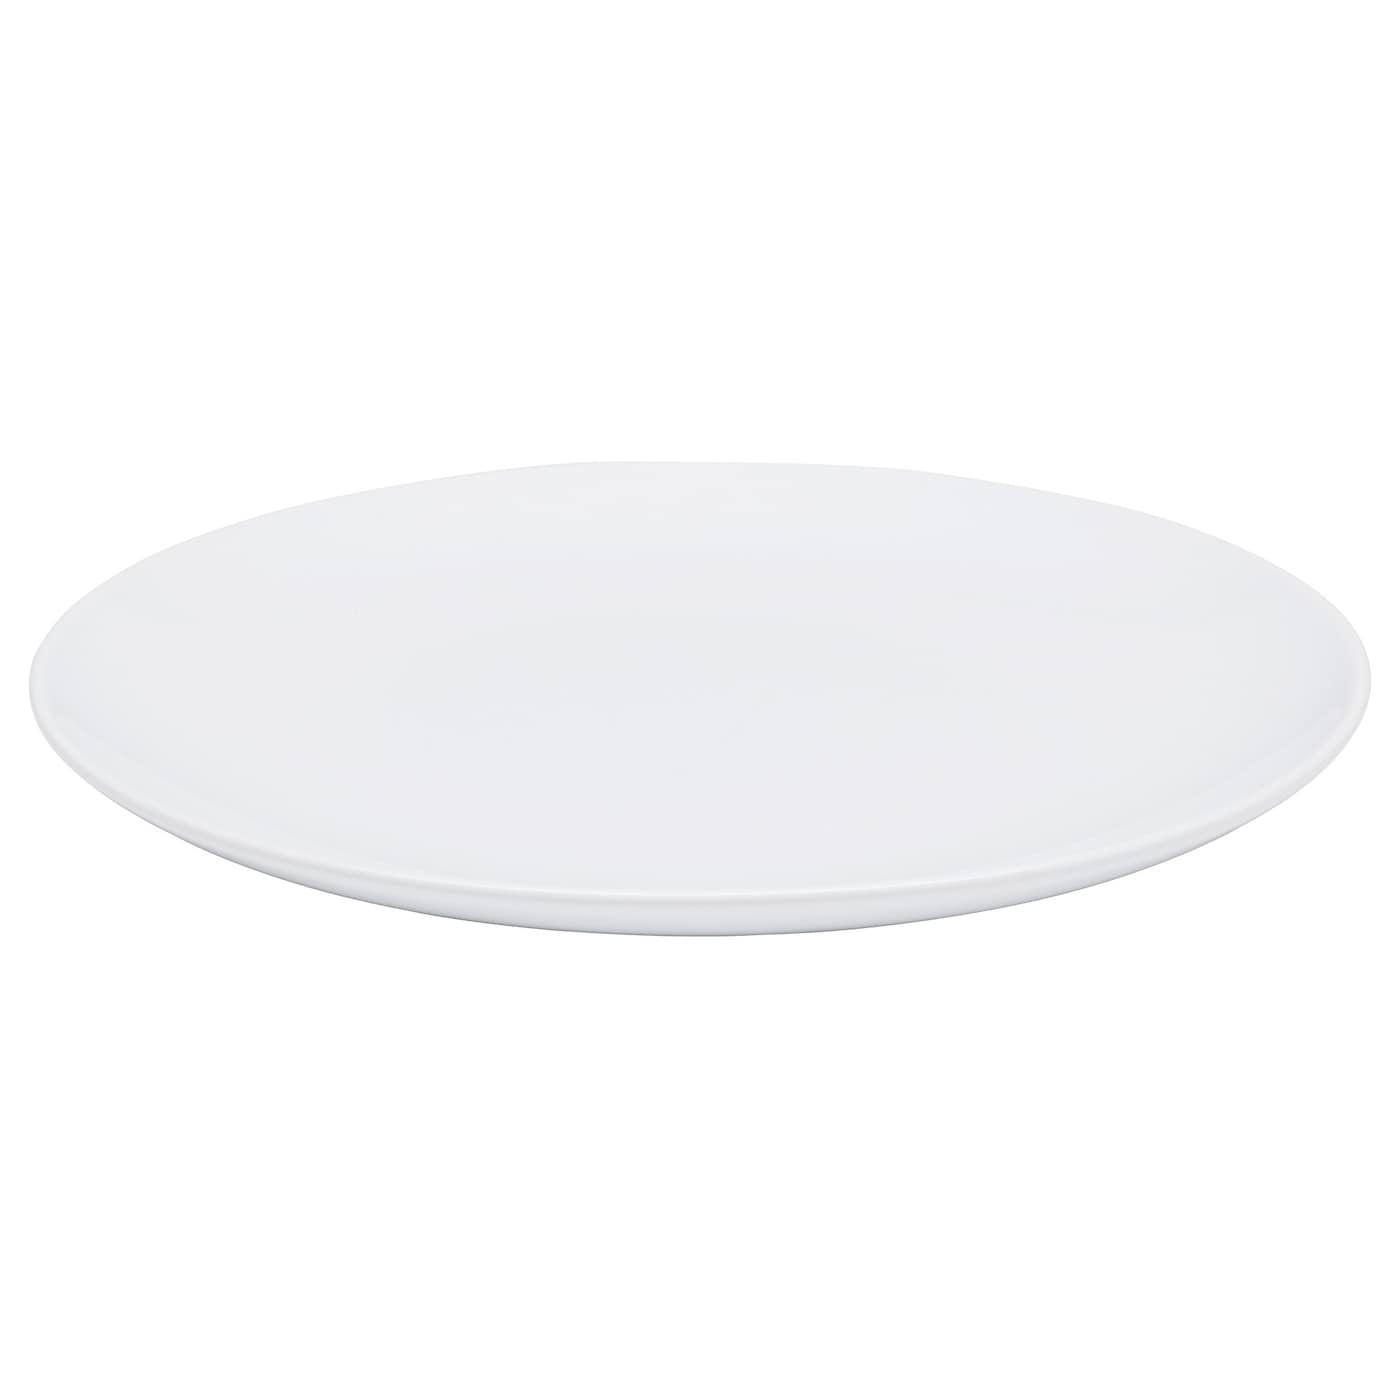 Dinner plates ikea ireland dublin for Aufsatzwaschbecken ikea